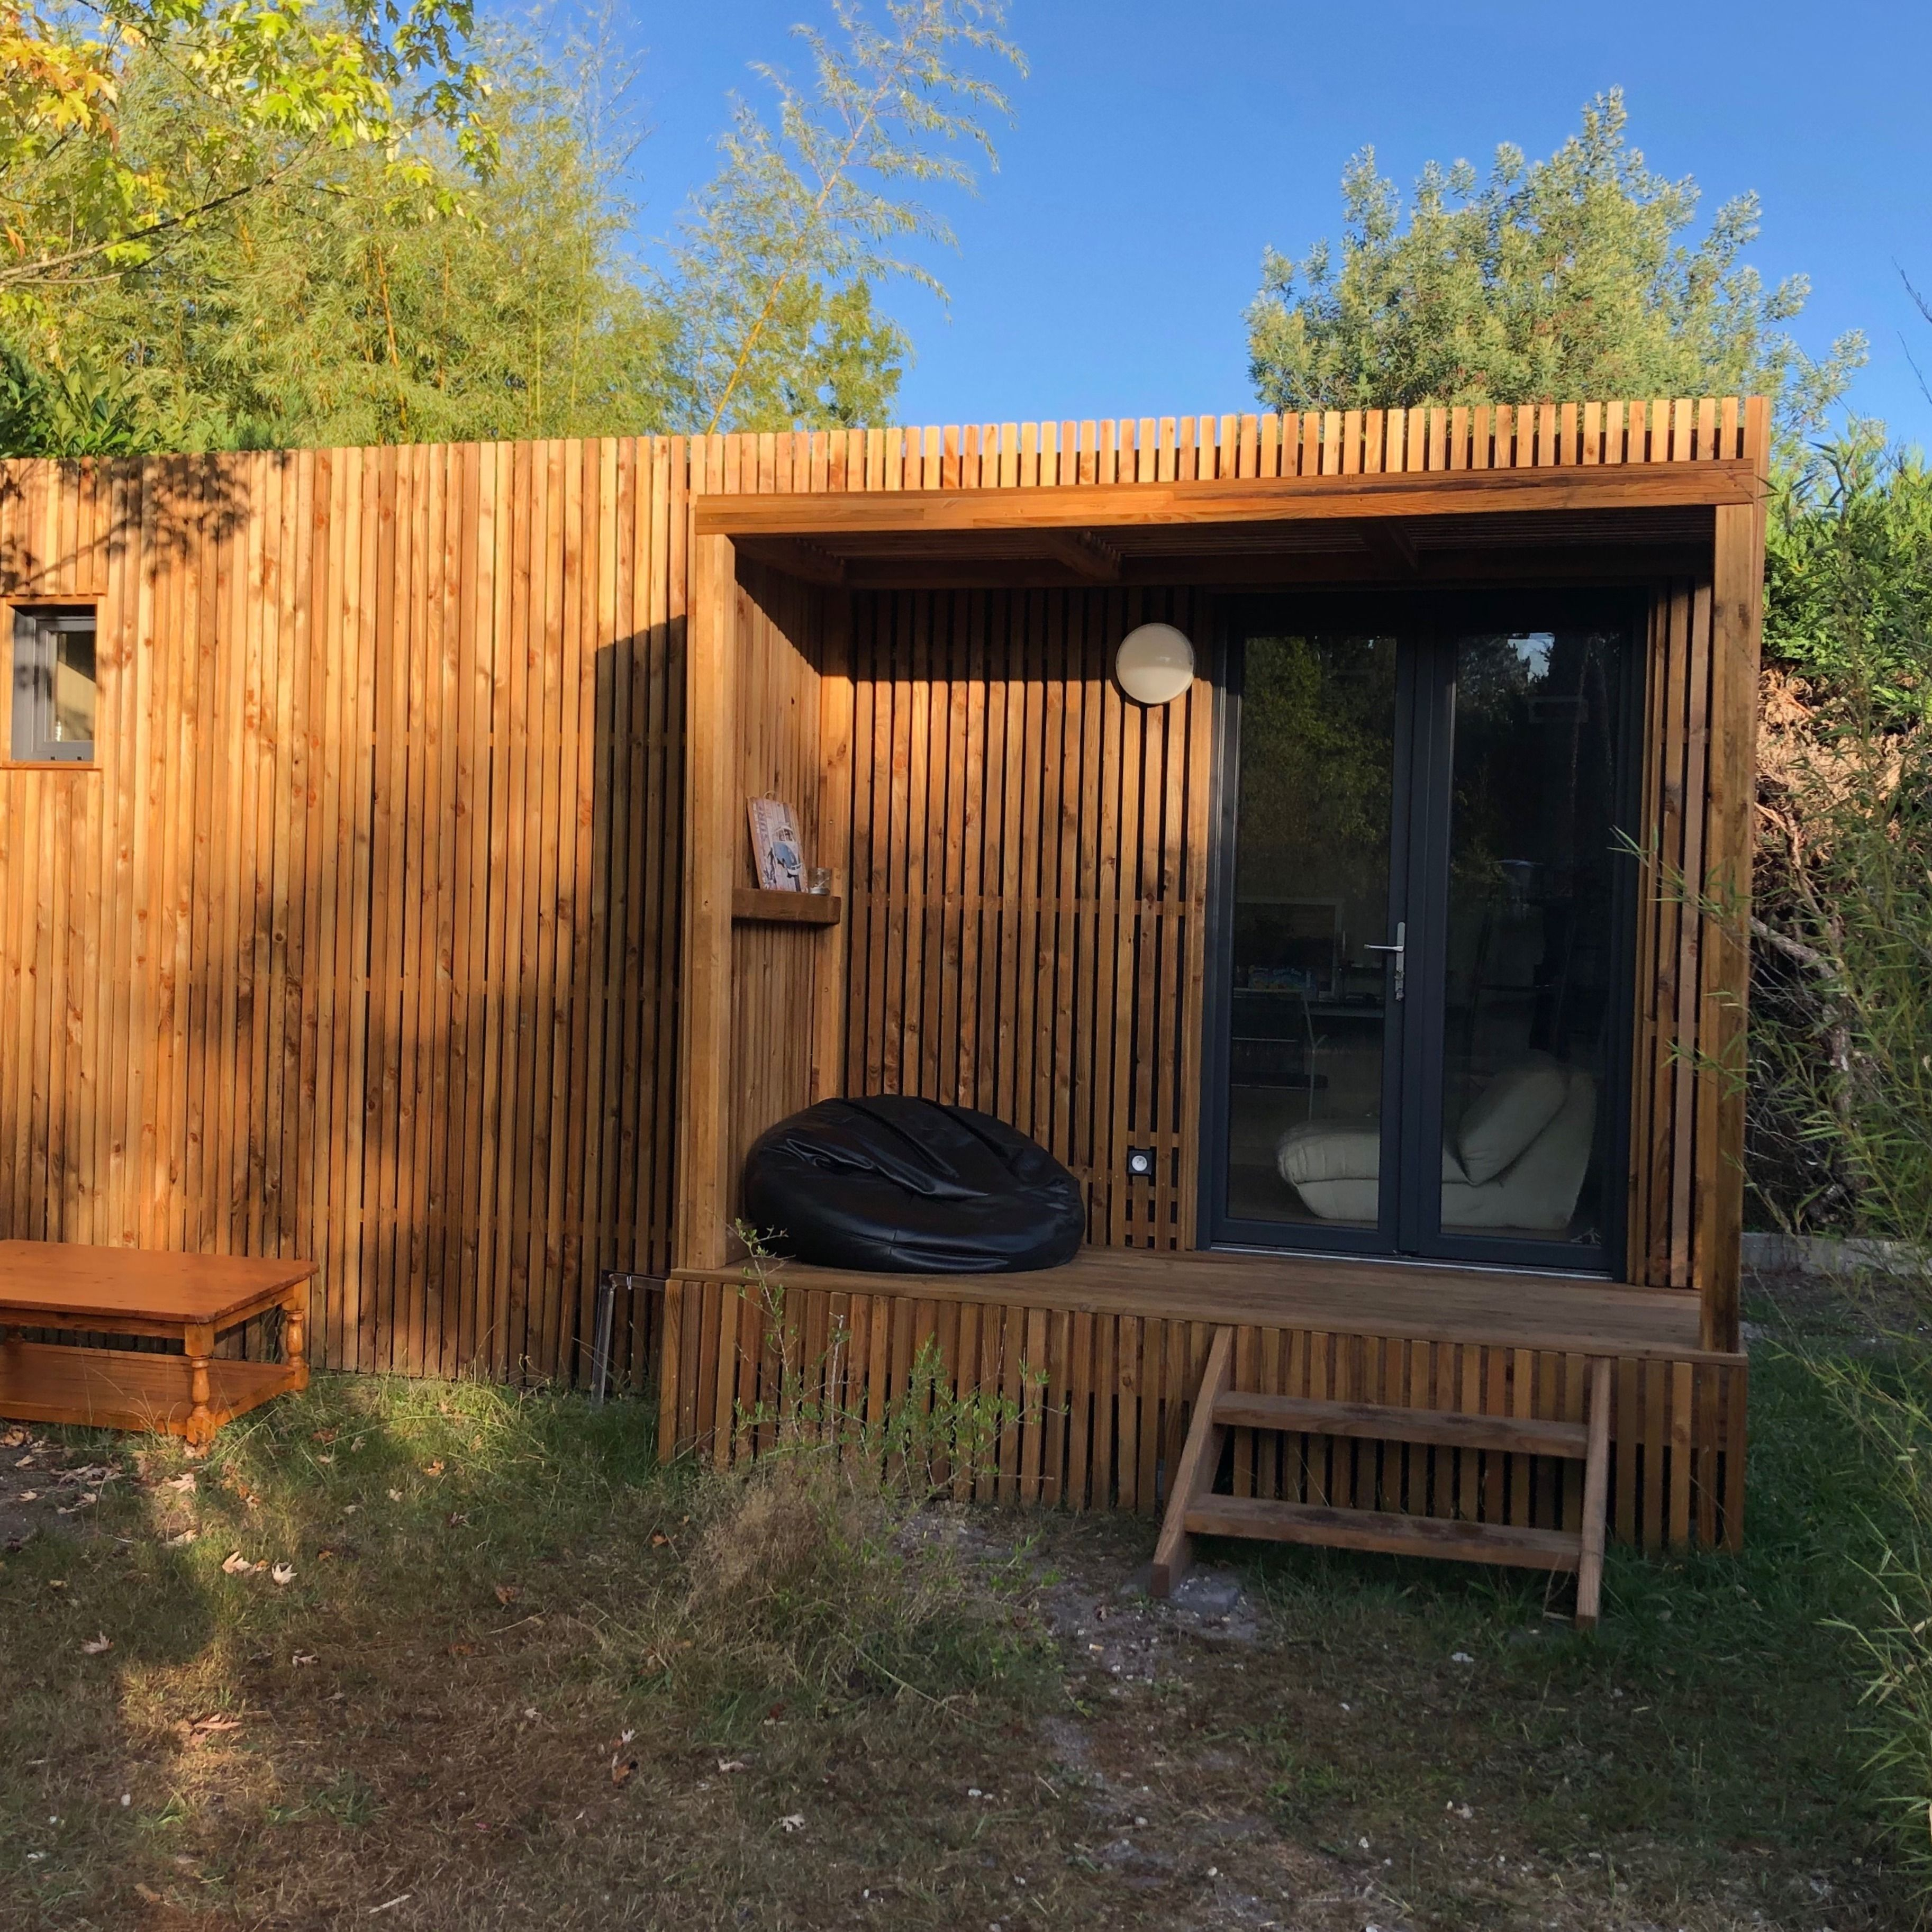 Un Studio De Jardin Greenkub Vous Permet De Gagner Jusqu'à ... concernant Abri De Jardin 30M2